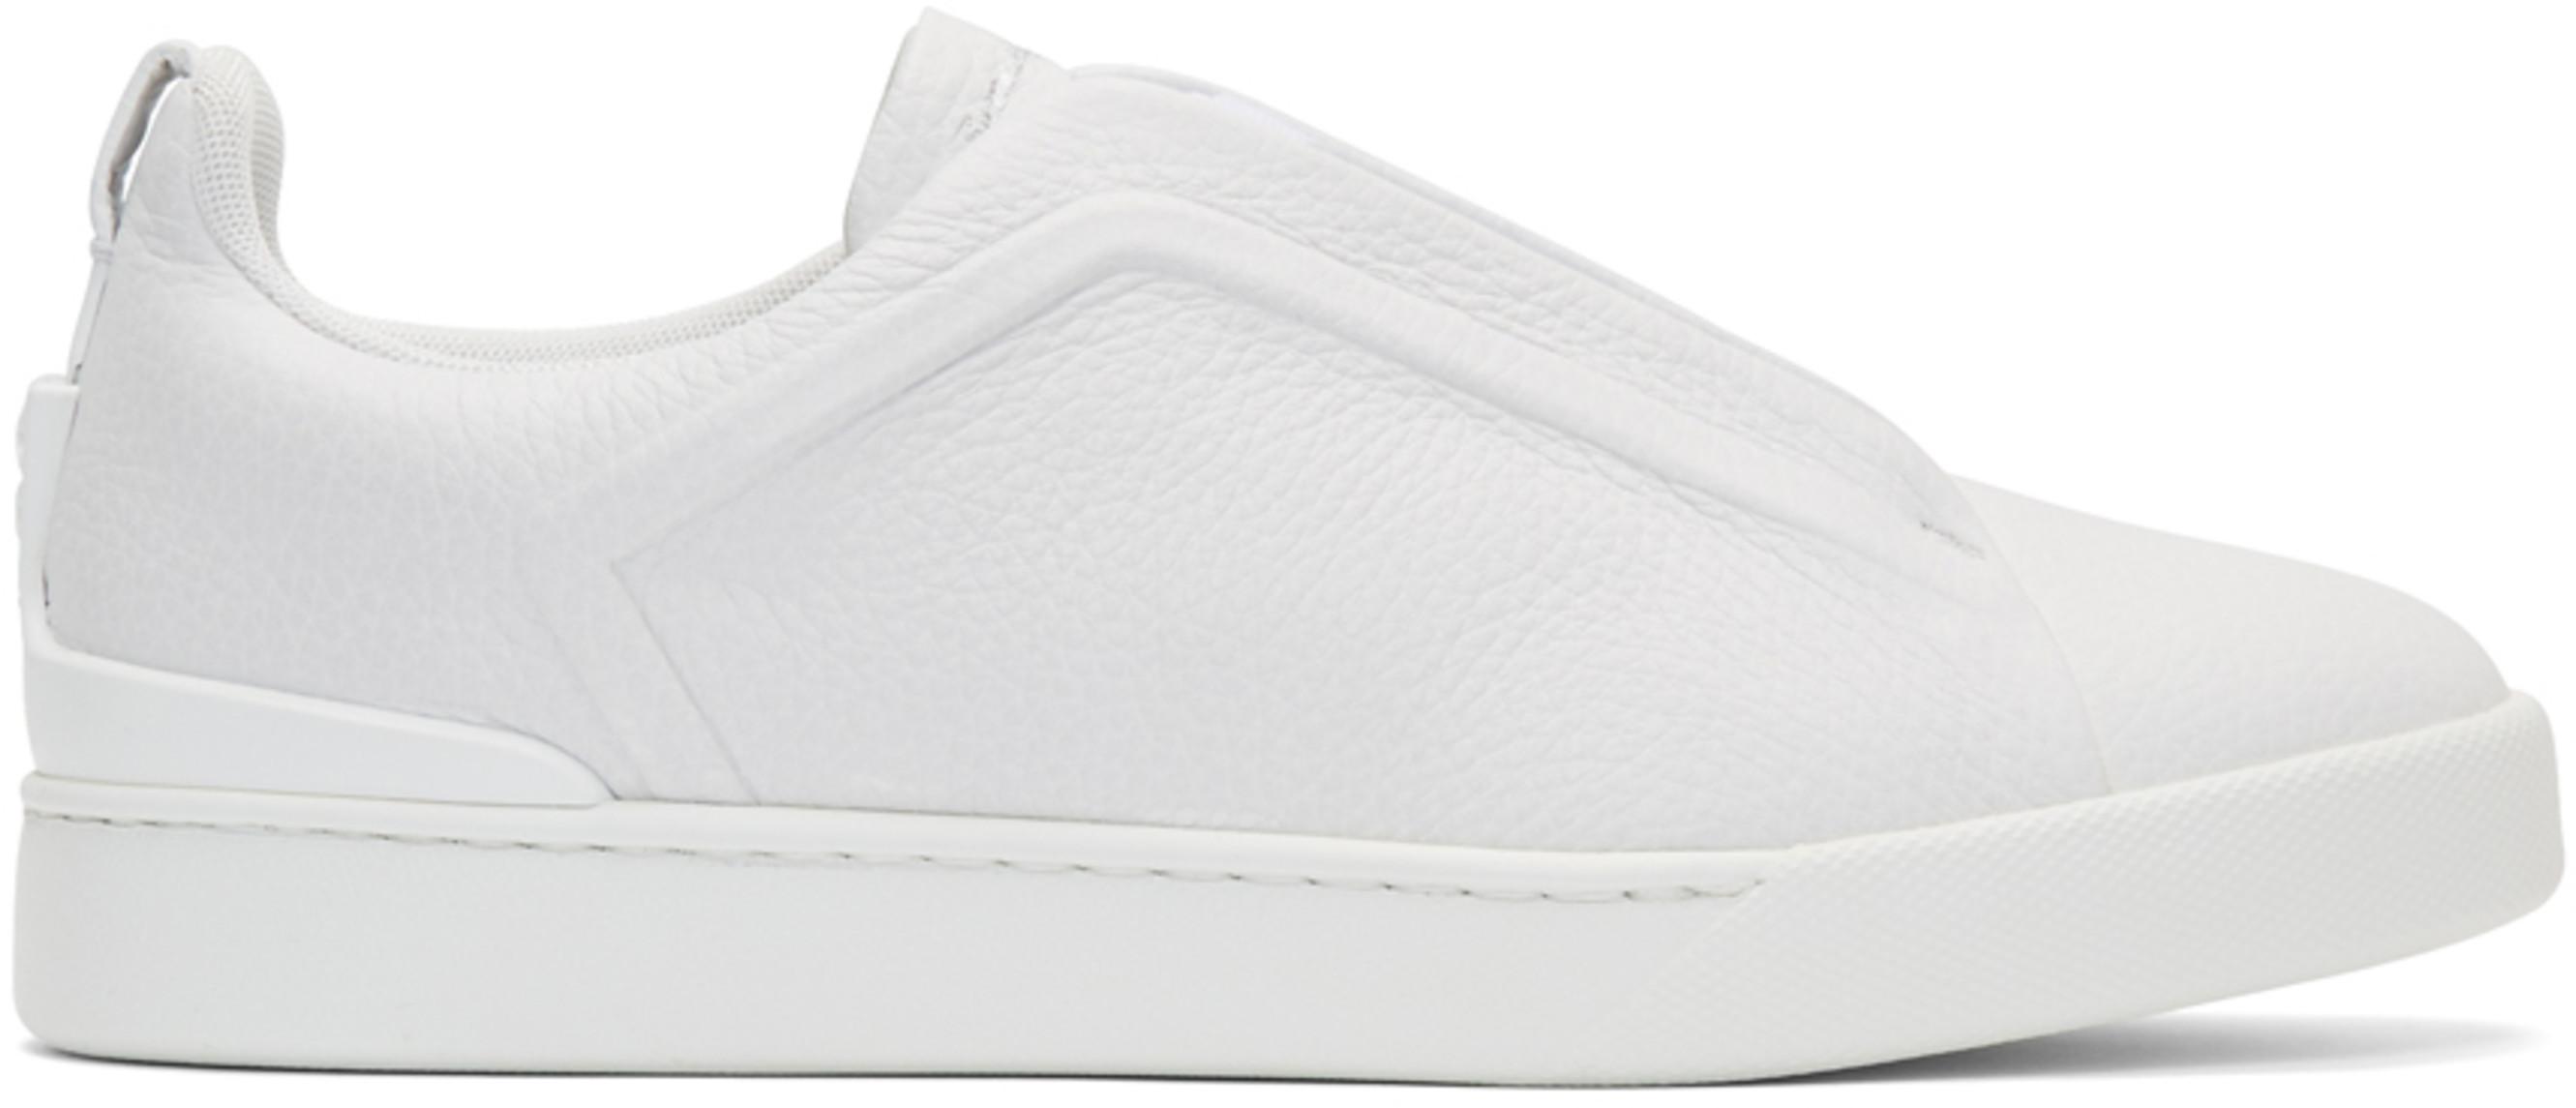 9ec0f87a White Triple Stitch Slip-On Sneakers